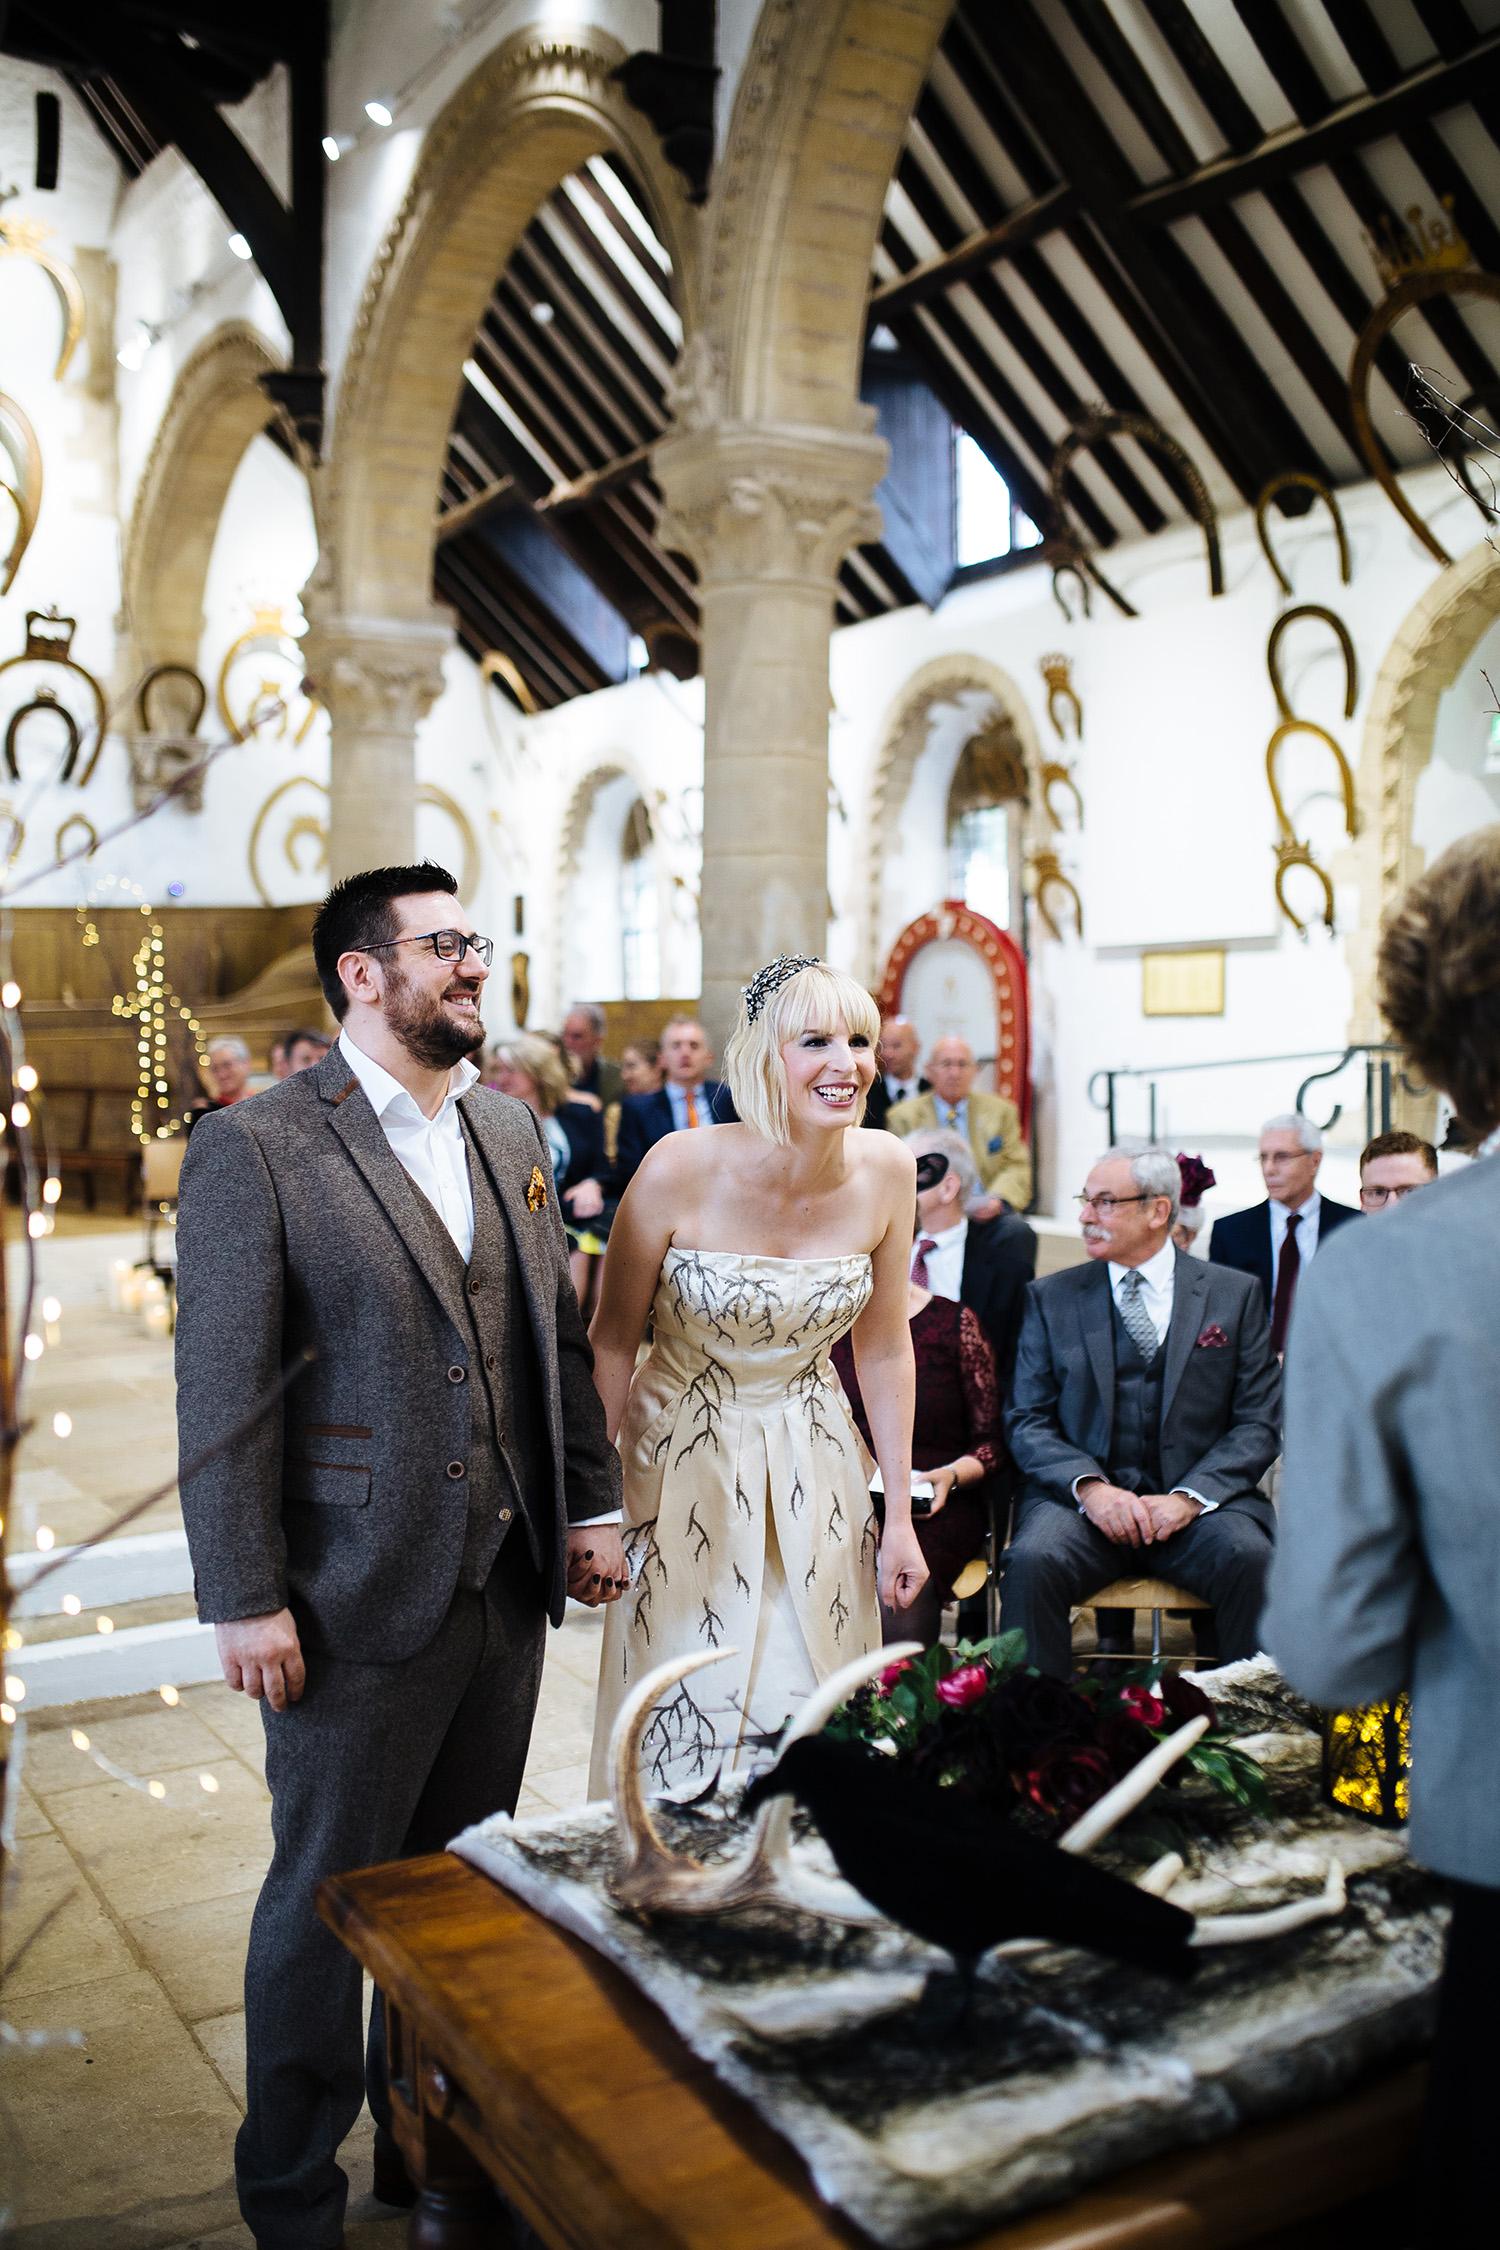 FRIDAY THE 13TH HALLOWEEN WEDDING RUTLAND011.jpg